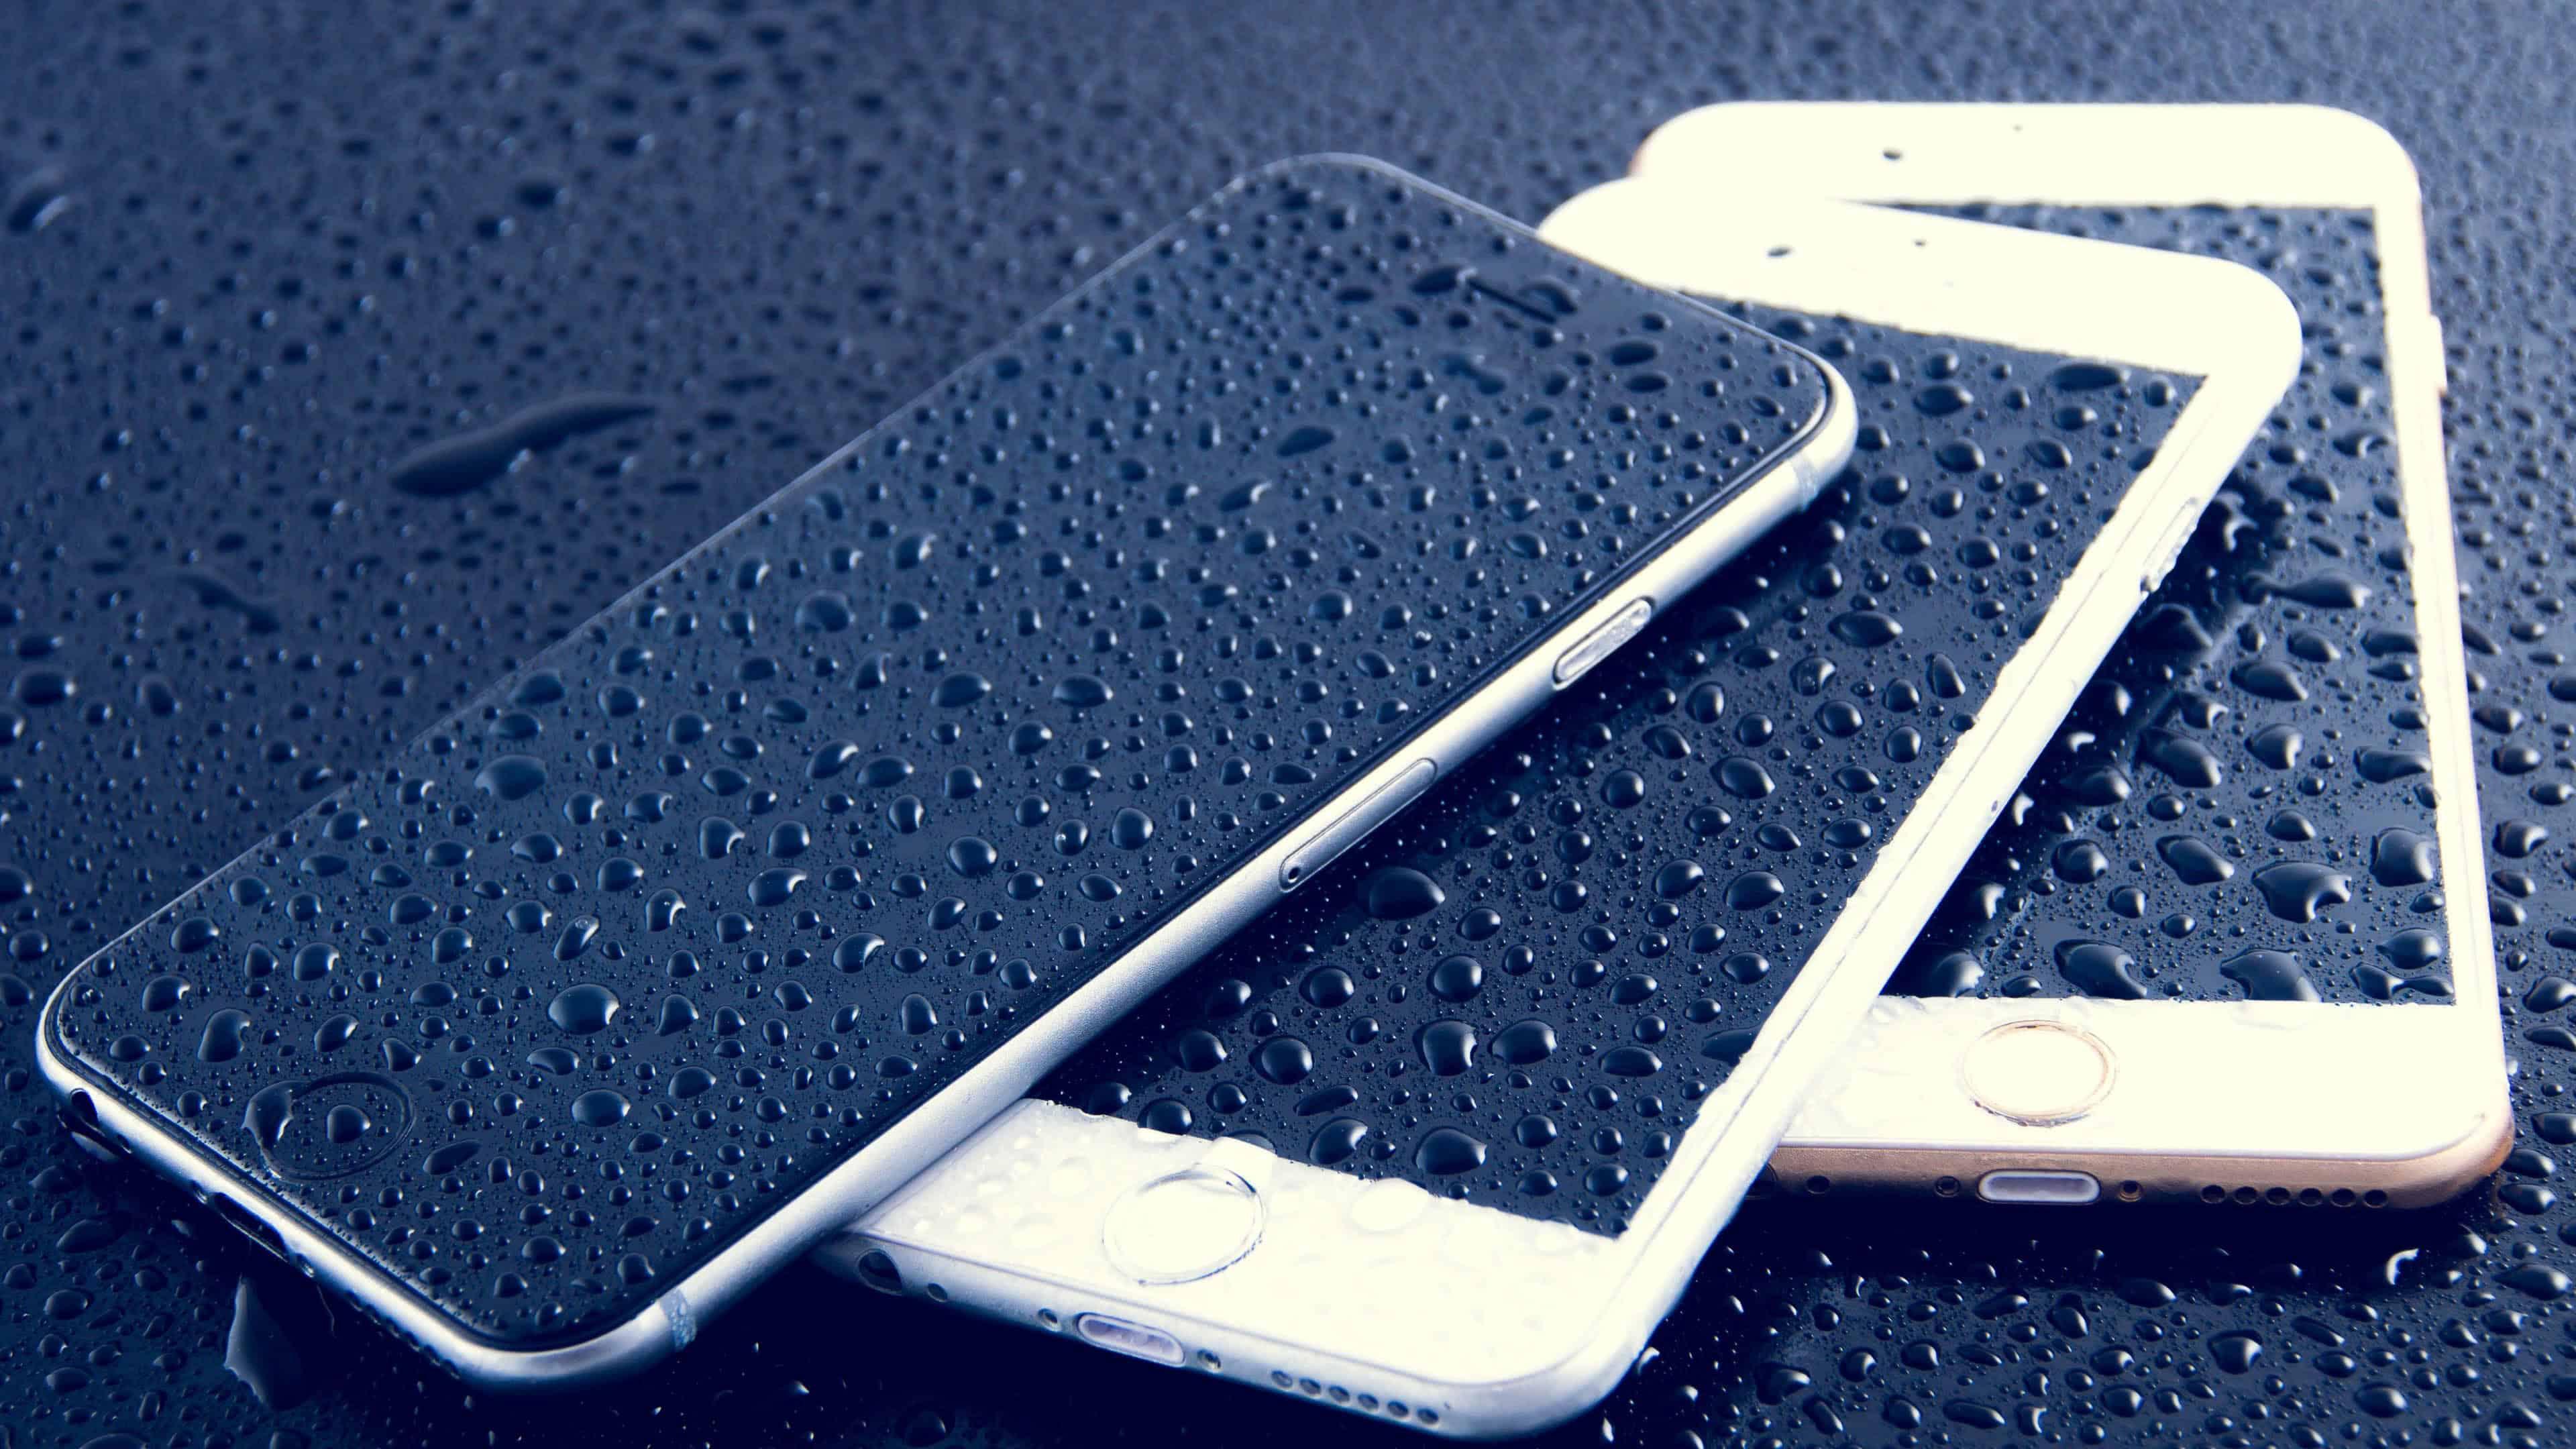 Iphone 6s Plus 4k Wallpaper: Apple IPhone 6S Waterproof UHD 4K Wallpaper